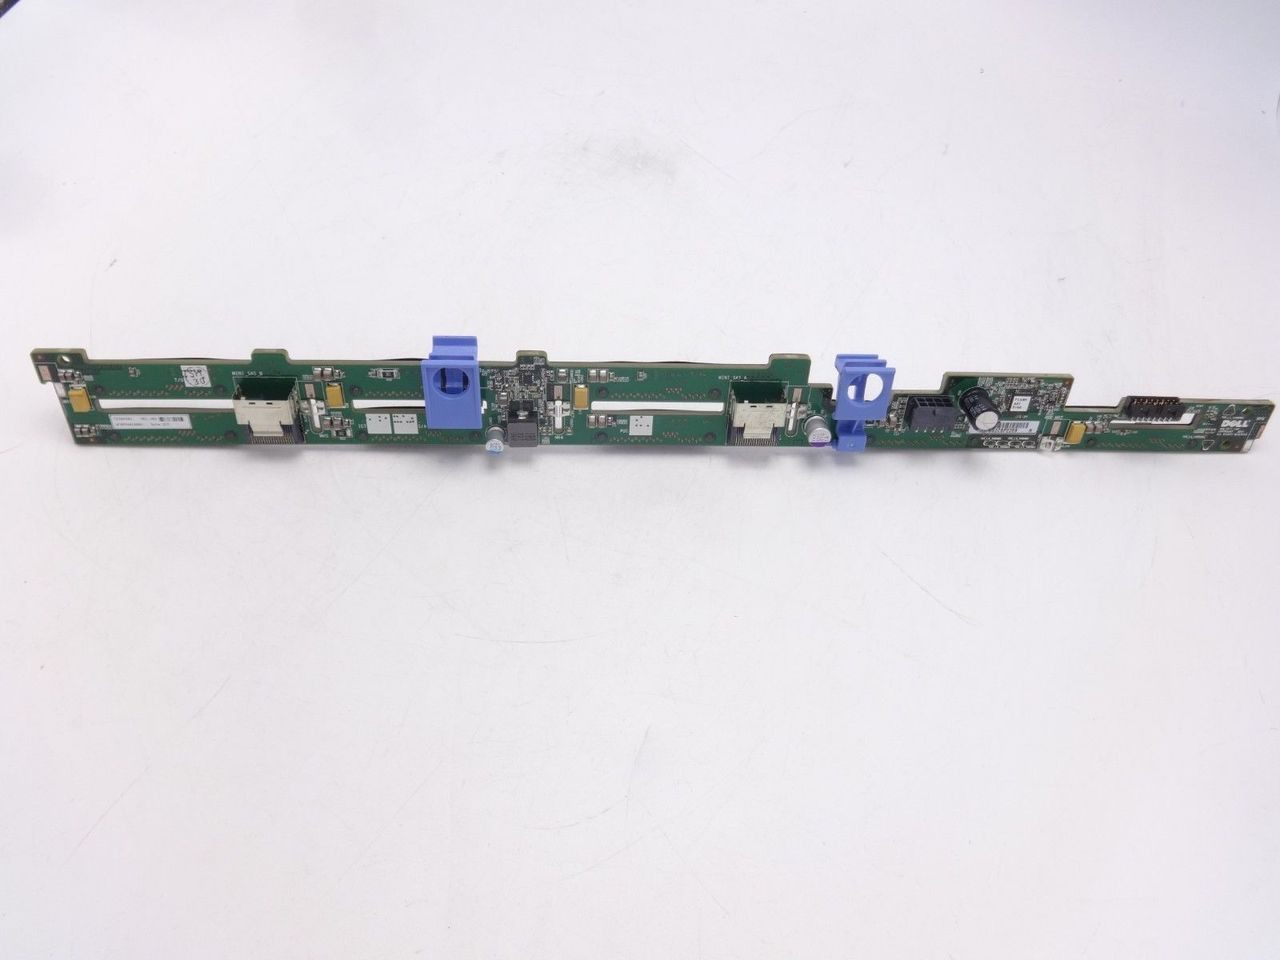 KVGG1 Dell Poweredge R620 R320 R420 8 x 2.5 Backplane